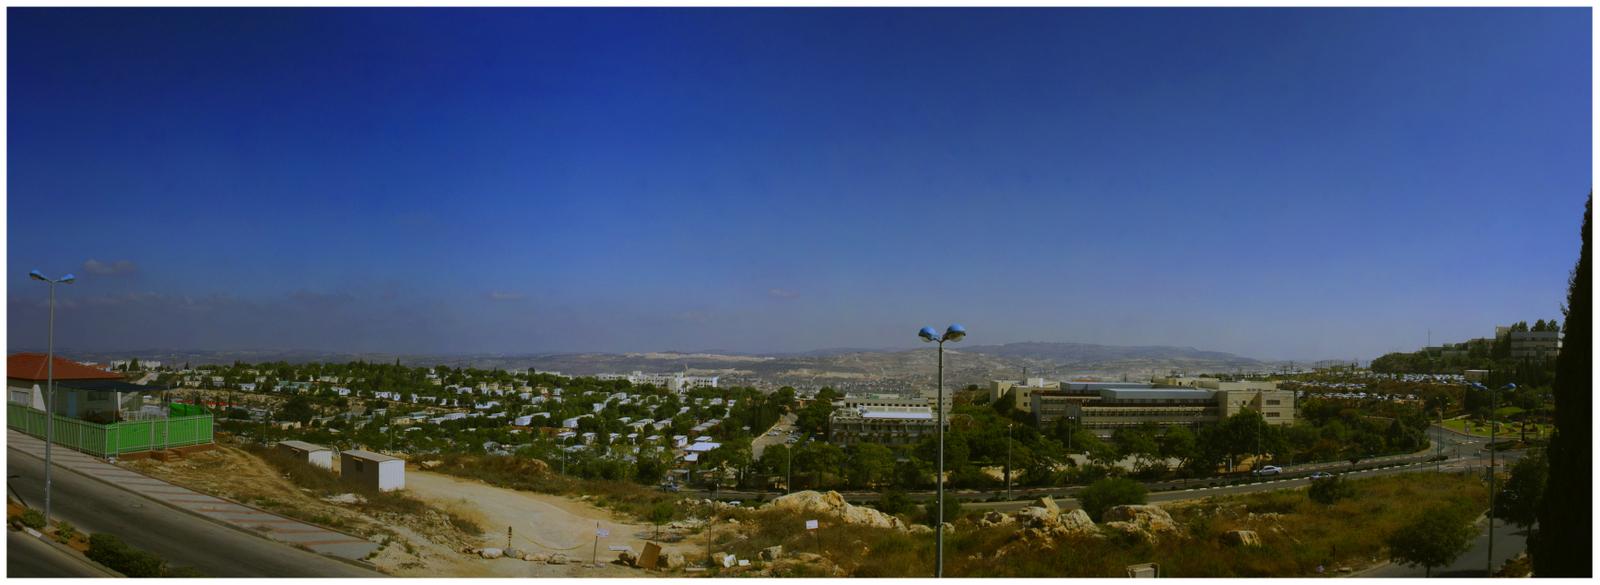 _MG_0859-1111 Panorama